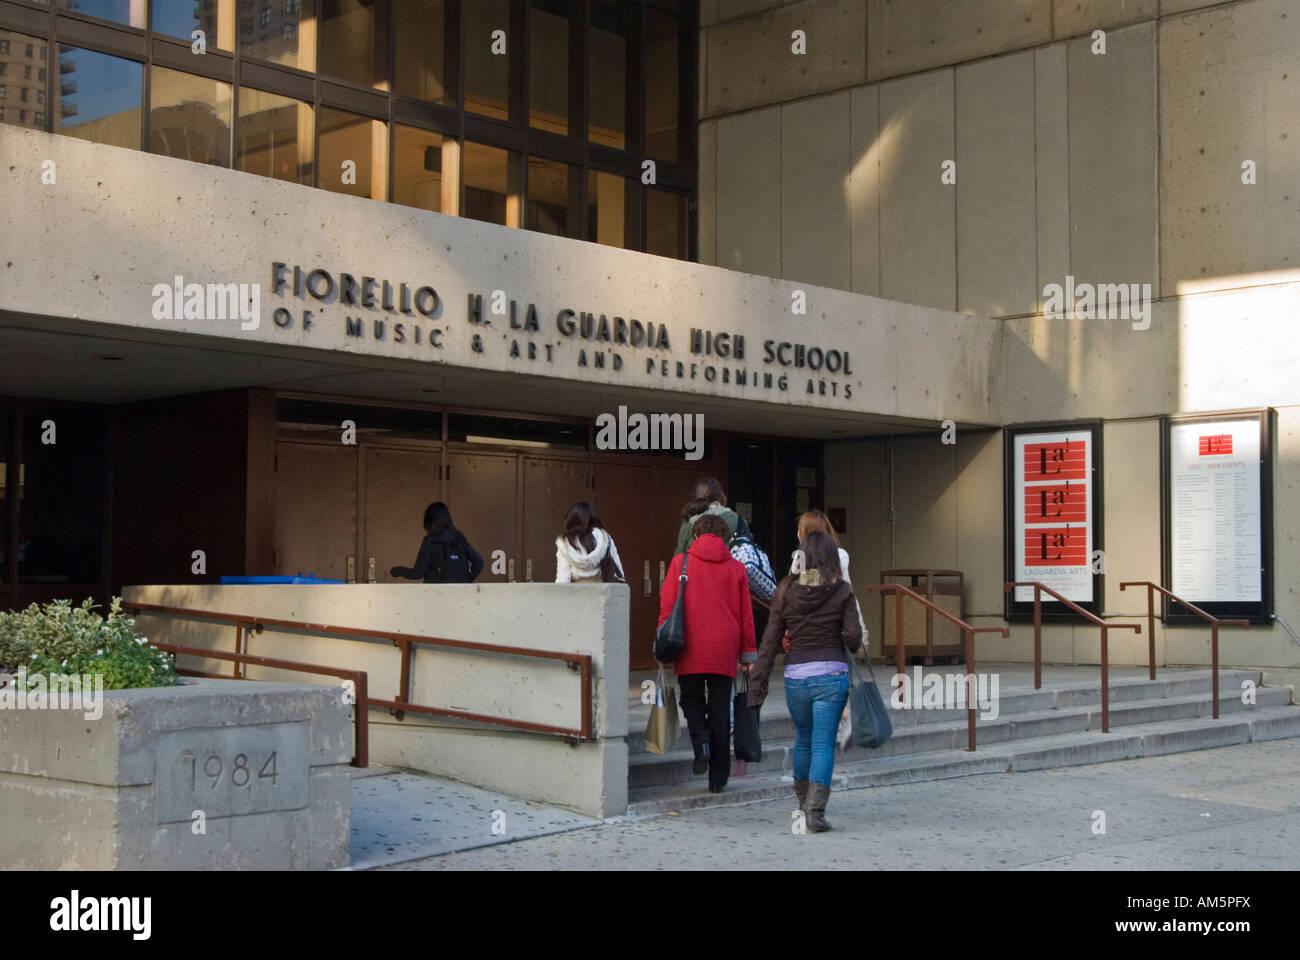 Fiorello H Laguardia High School Of Music Art And